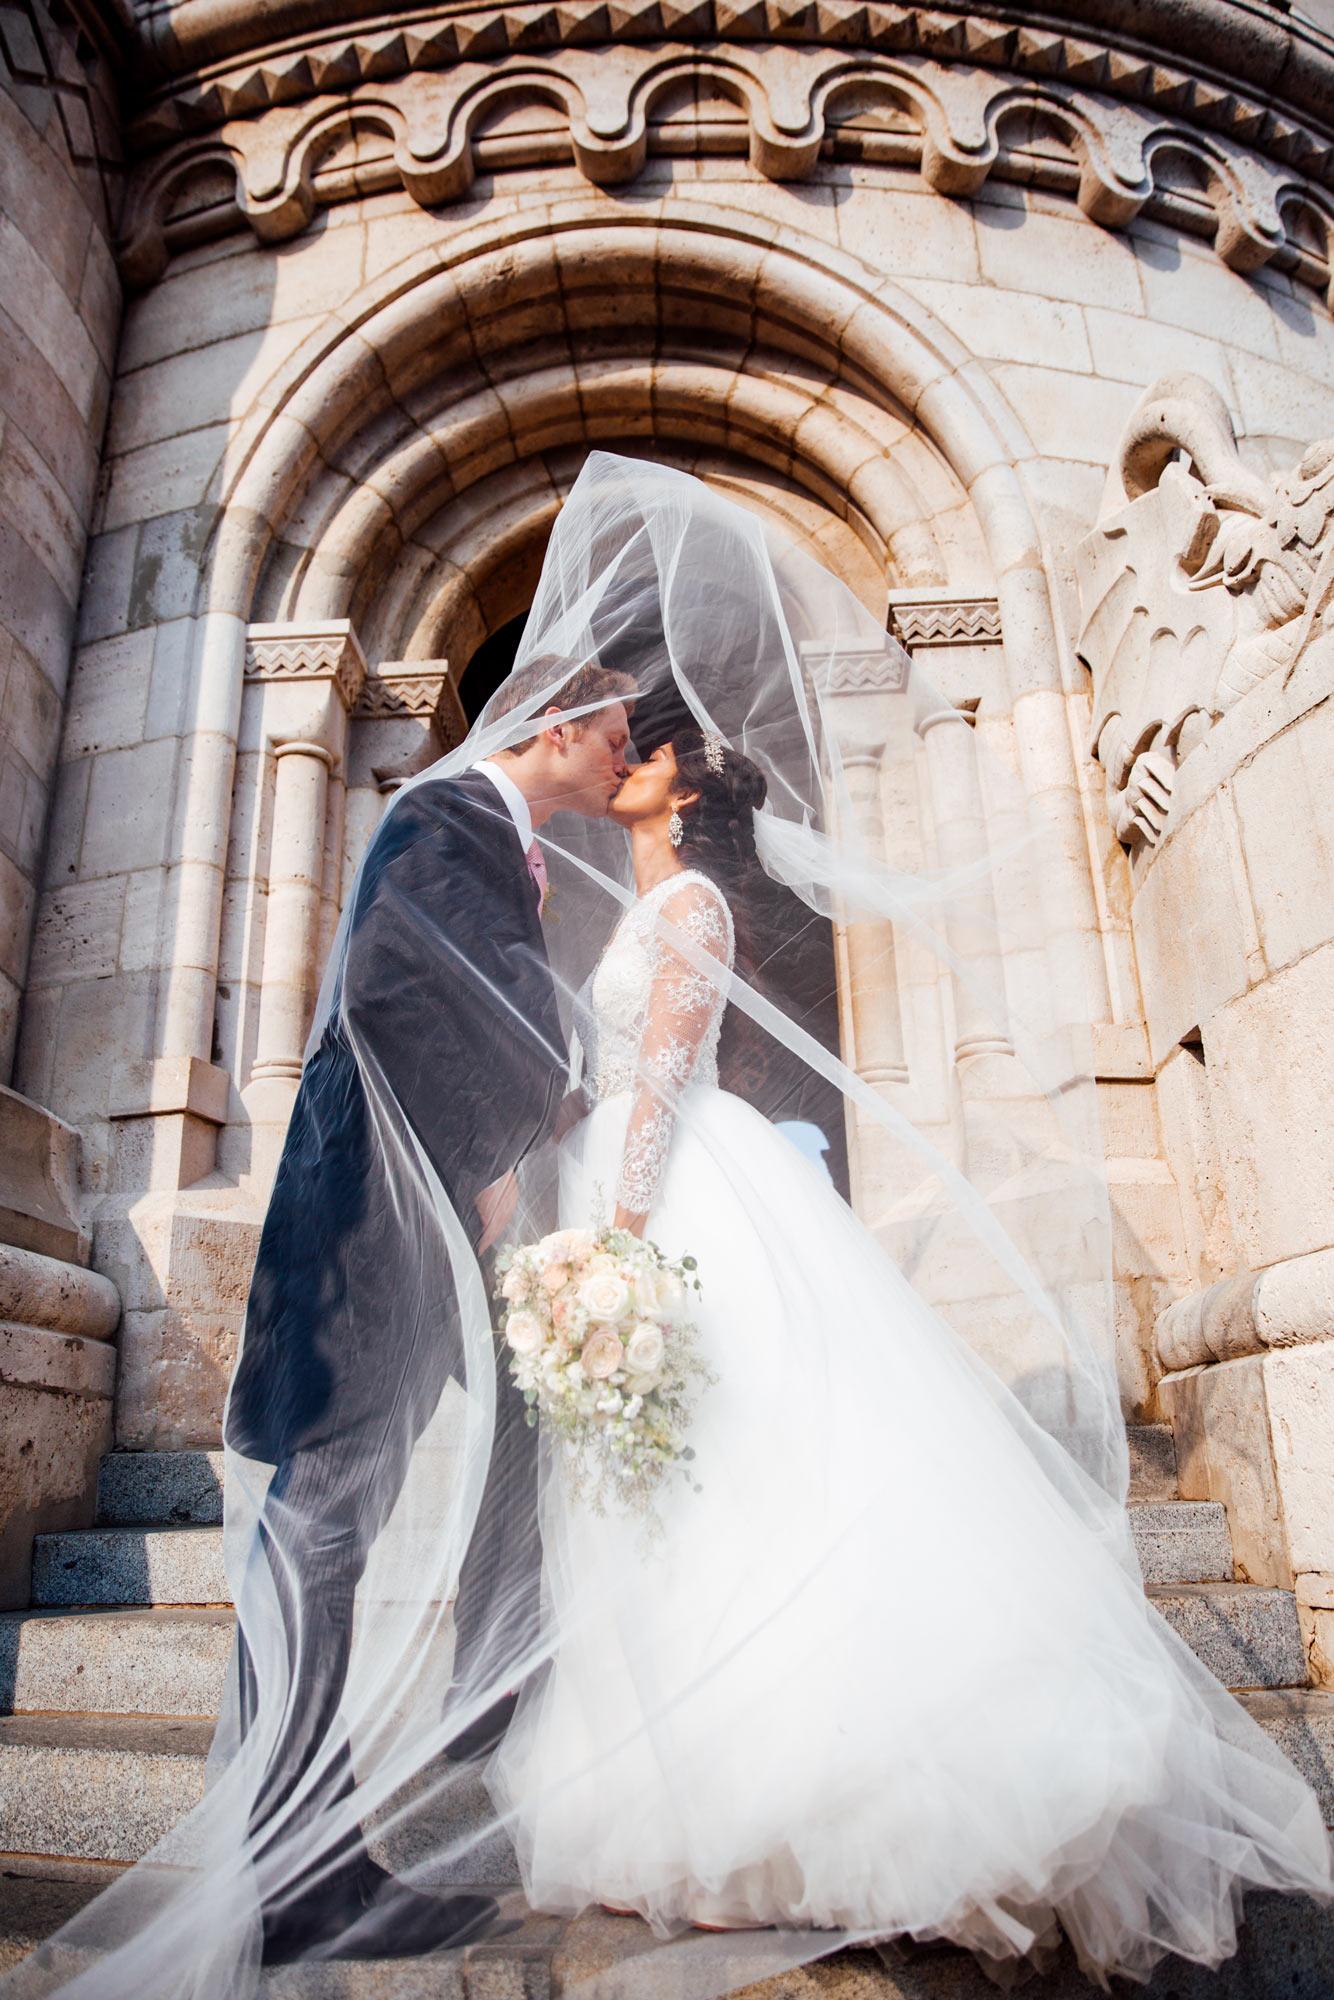 BeckyLee-wedding9.jpg